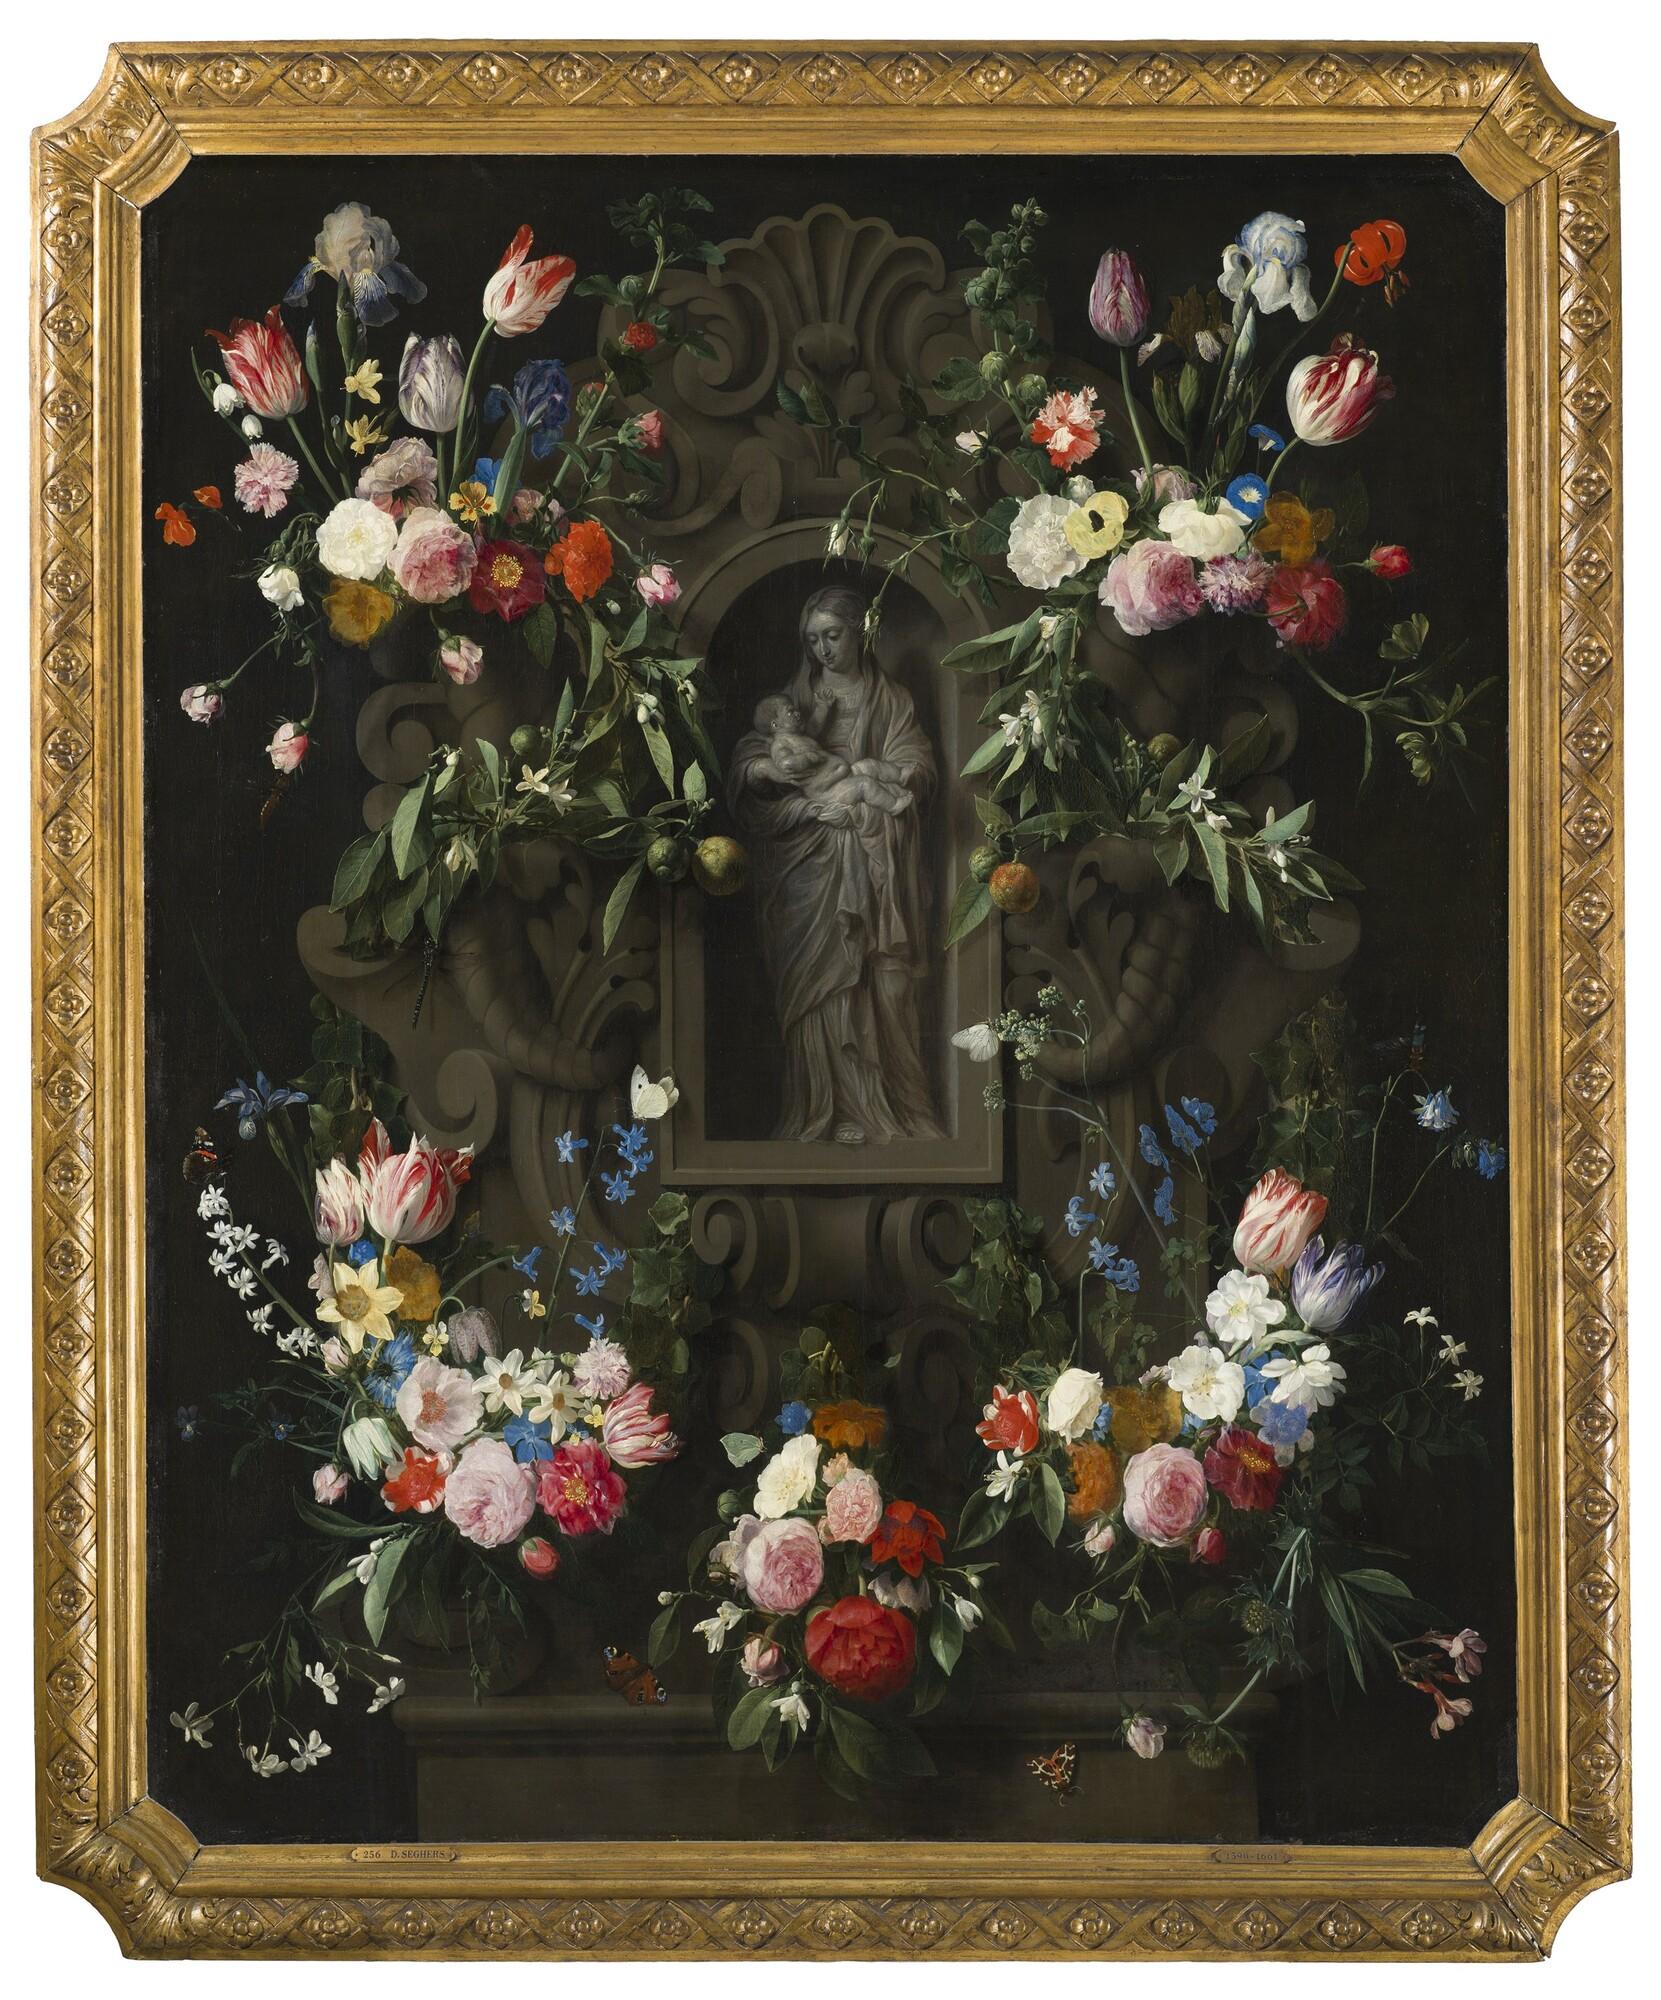 Bloemencartouche met Mariabeeld - Daniel Seghers, Thomas Willeboirts Bosschaert, 1645